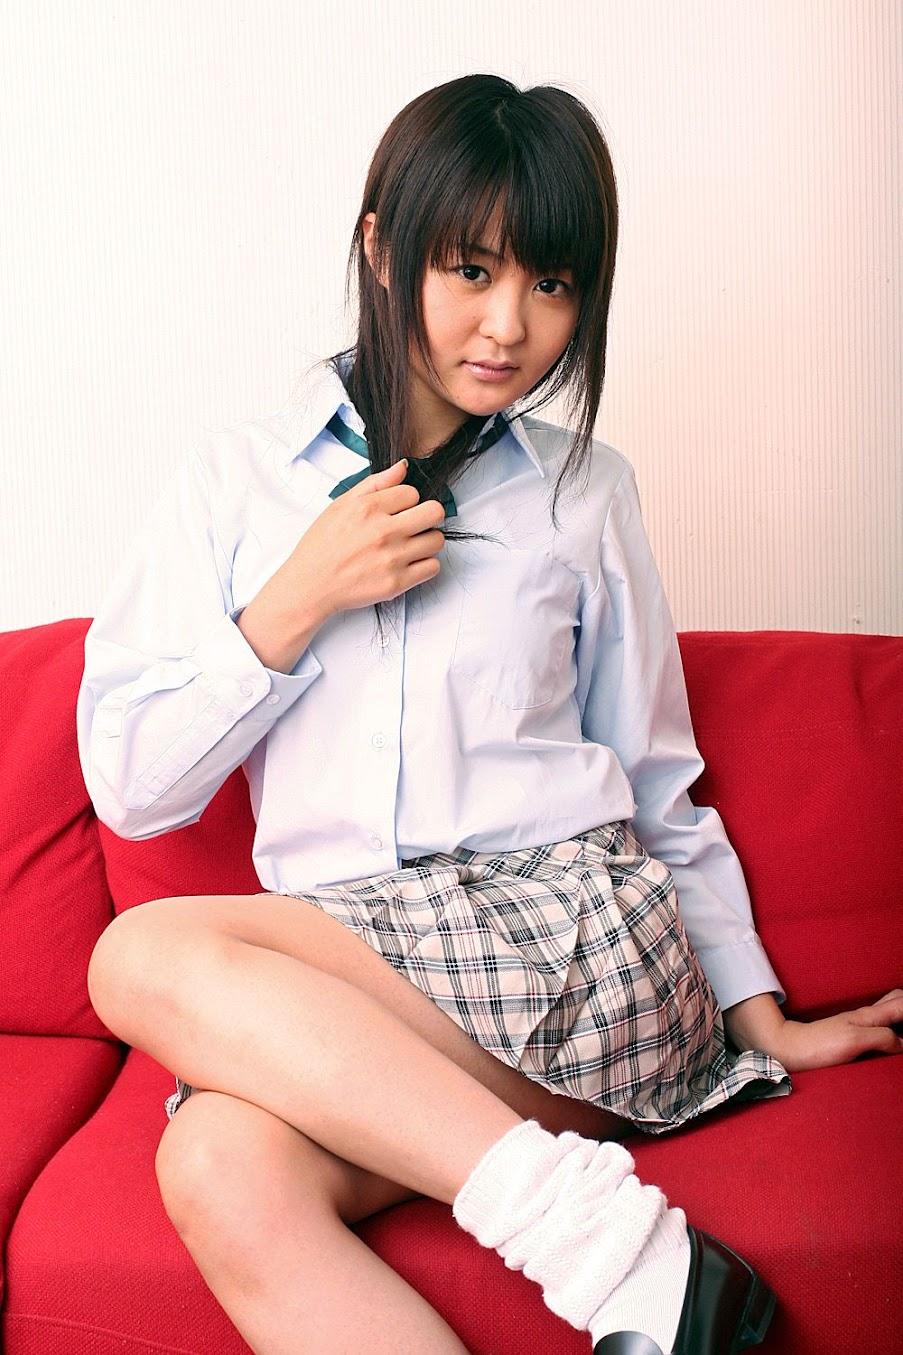 Mina Aida (相田水菜)